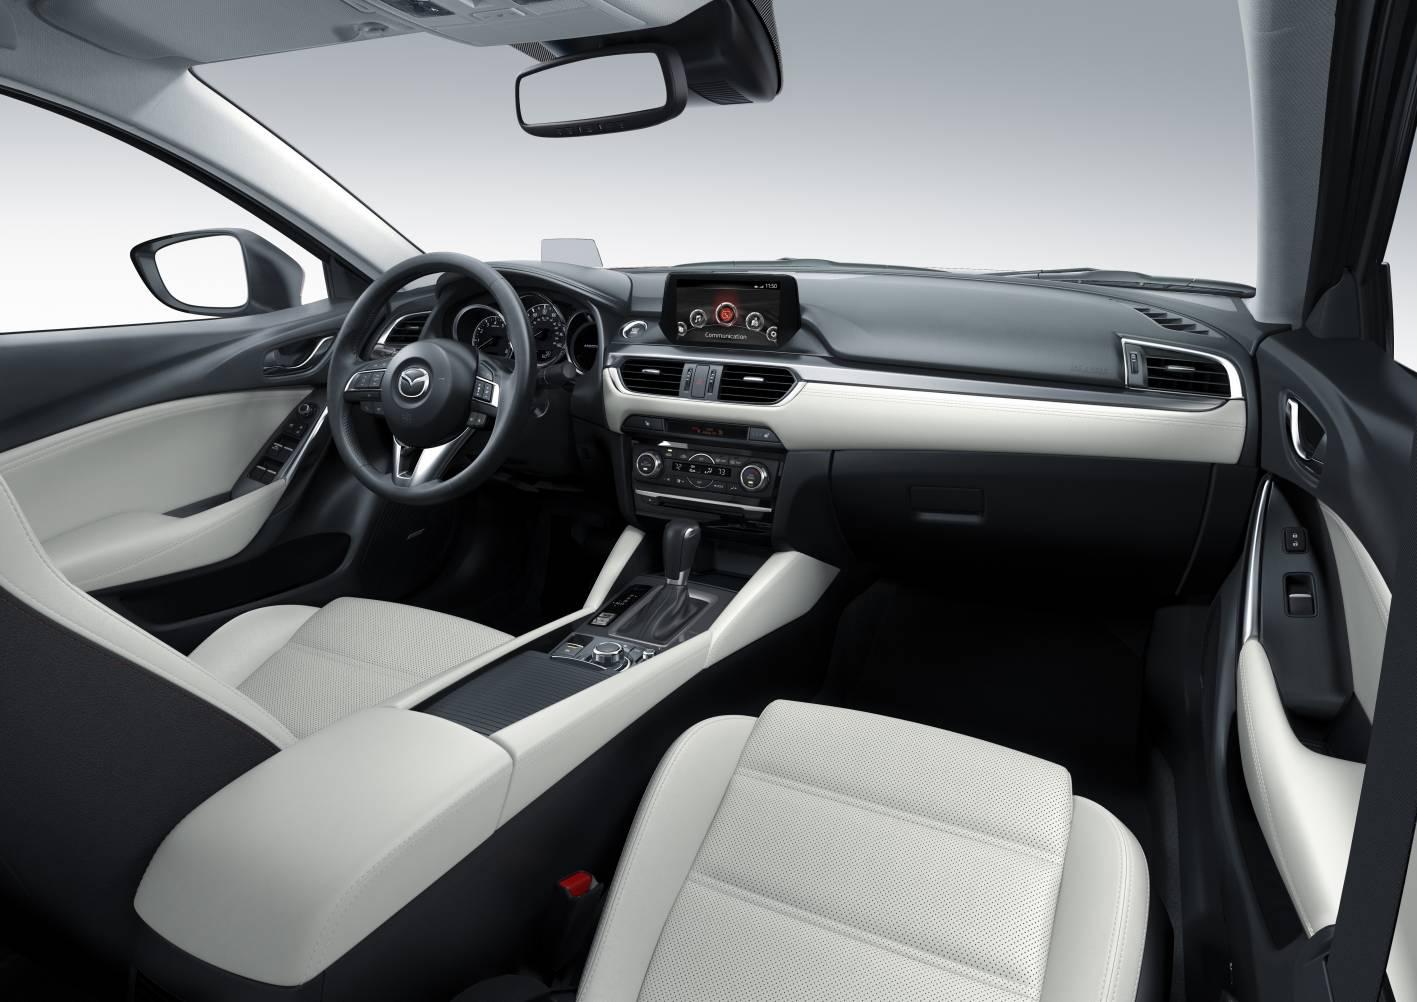 2018 Discovery Sport Interior >> 2015-mazda6-facelift-interior - ForceGT.com